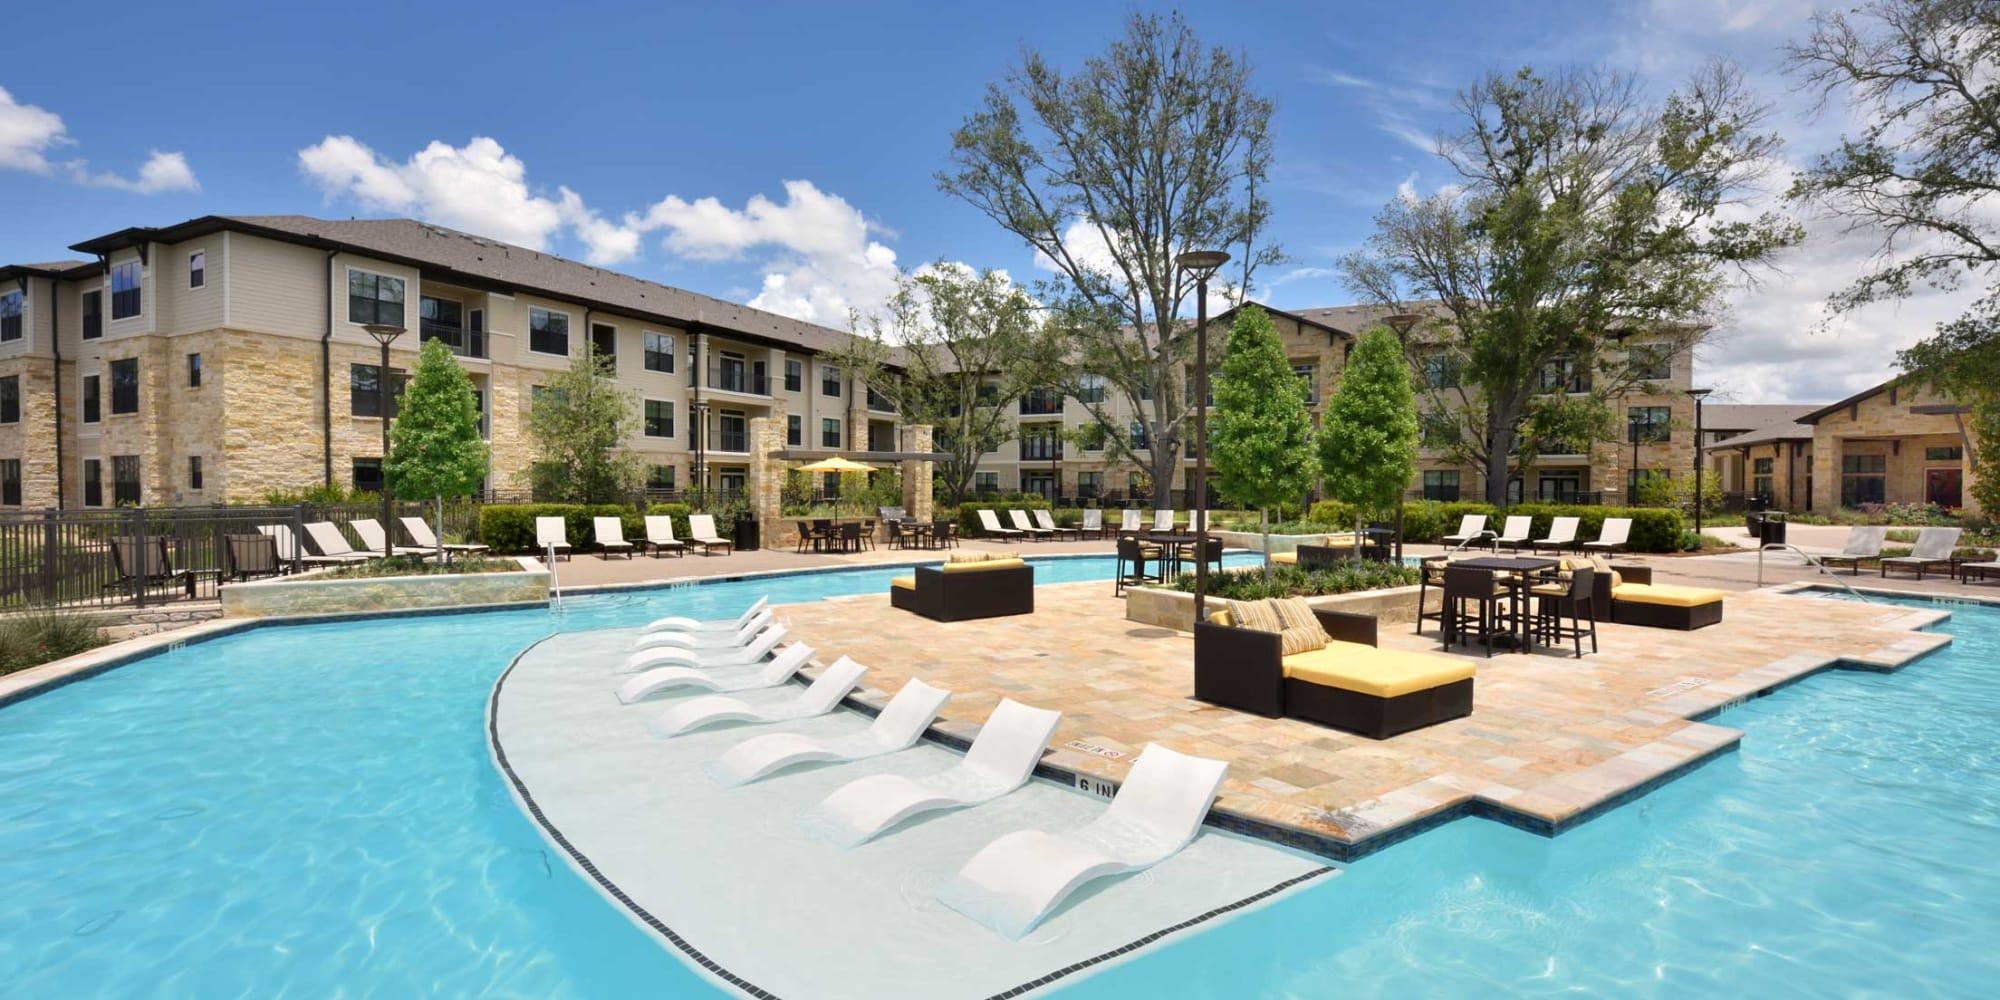 Apartments at Olympus Falcon Landing in Katy, Texas